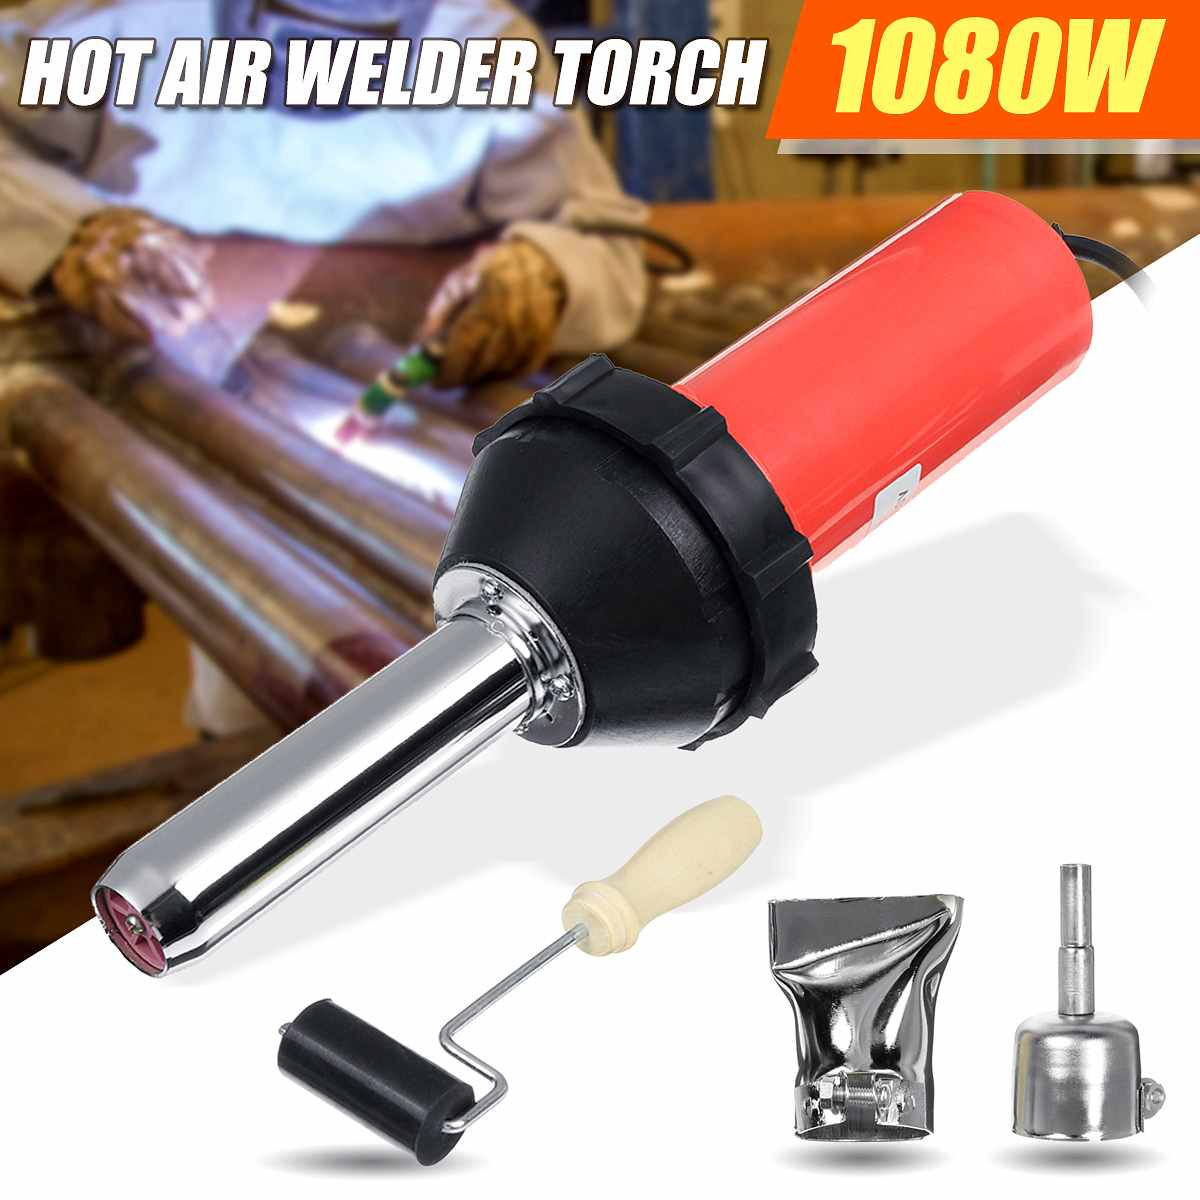 1080W Plastic Hot Air Welding Tool Welder Torch 2pcs Nozzles Roller Adapter UK